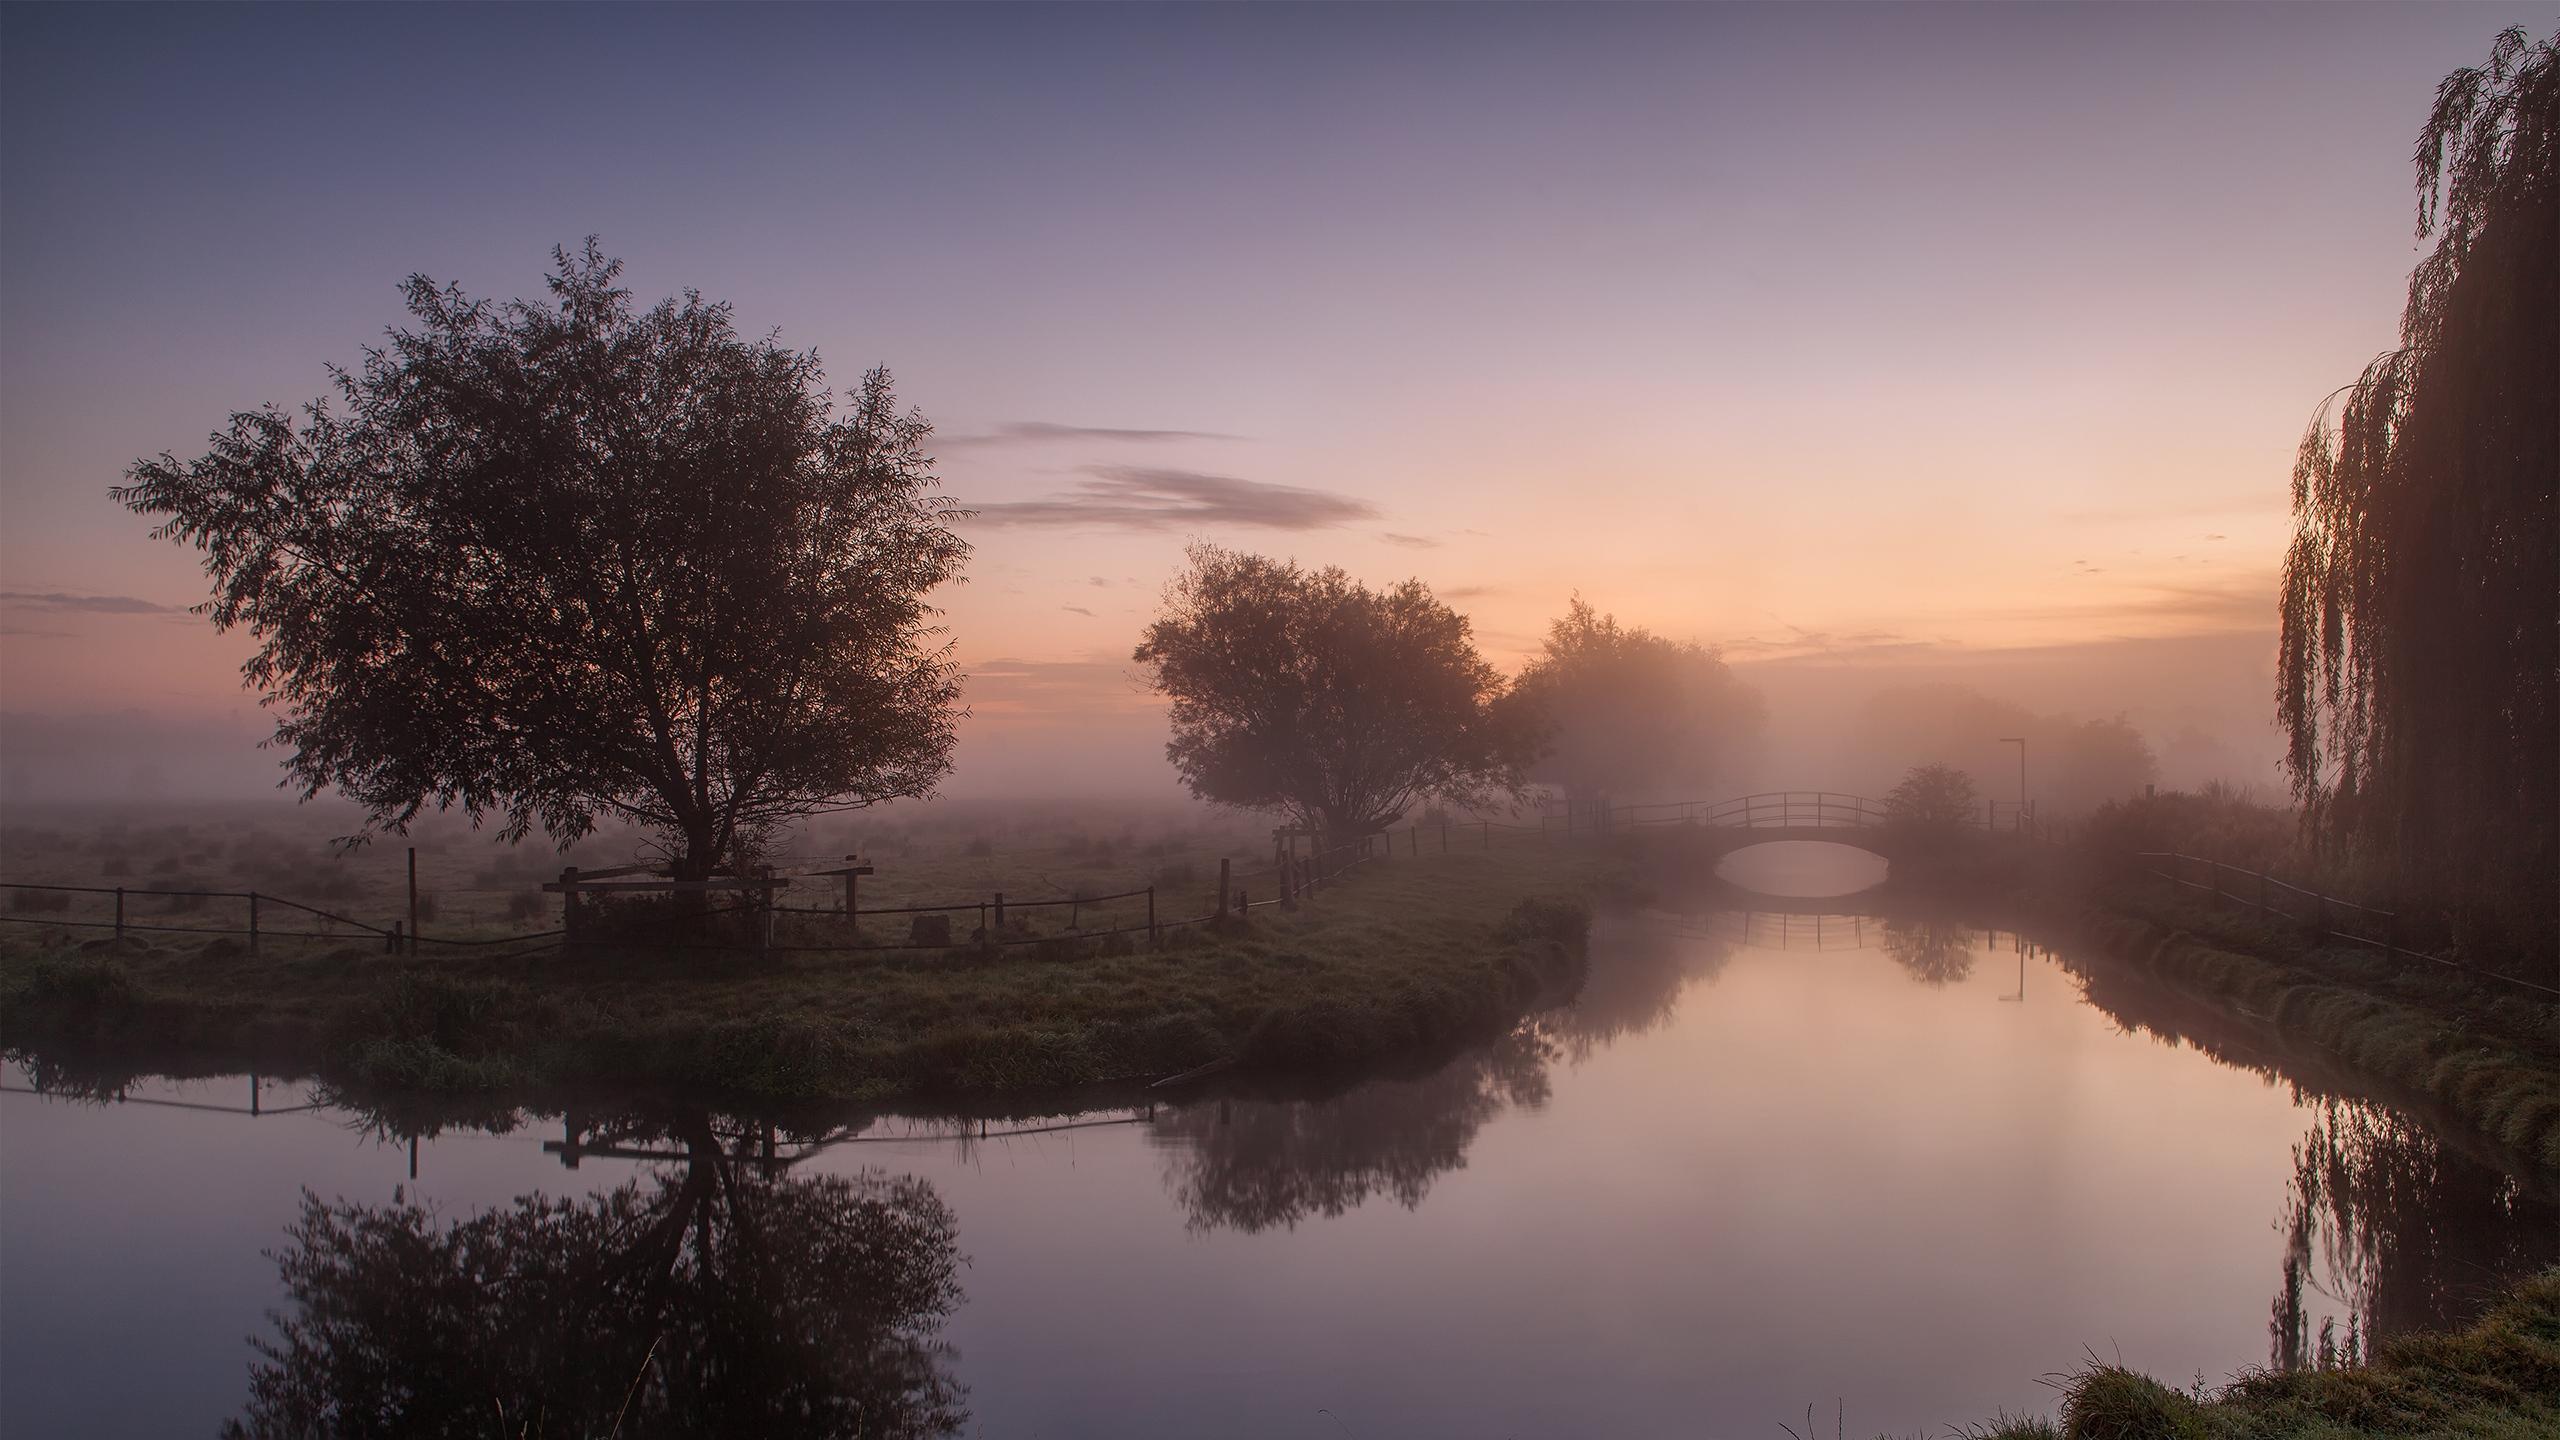 2560x1440 Wallpaper lake, mist, beautiful sky